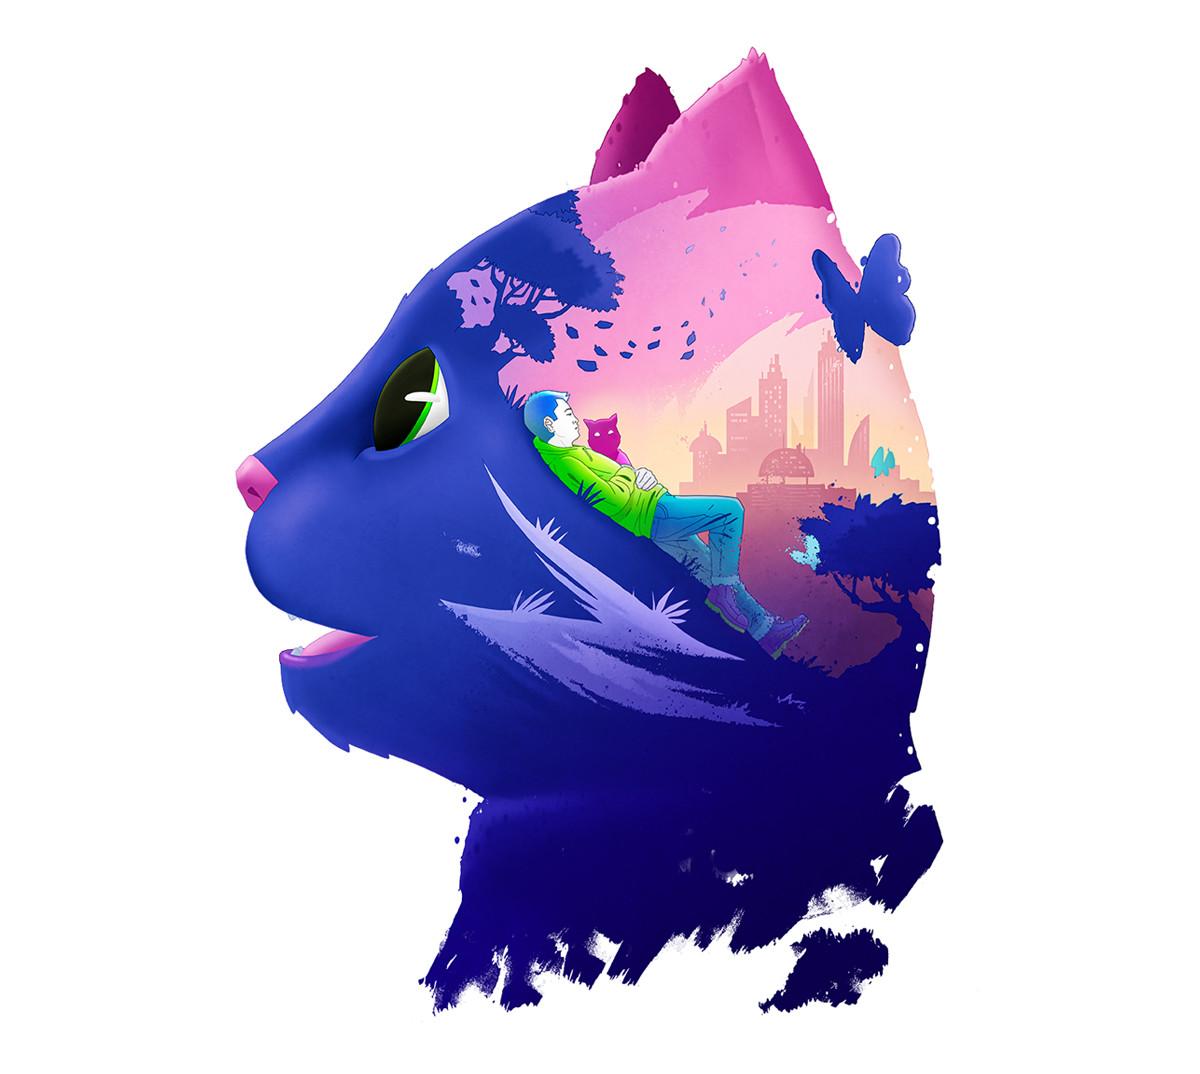 Macskaidők